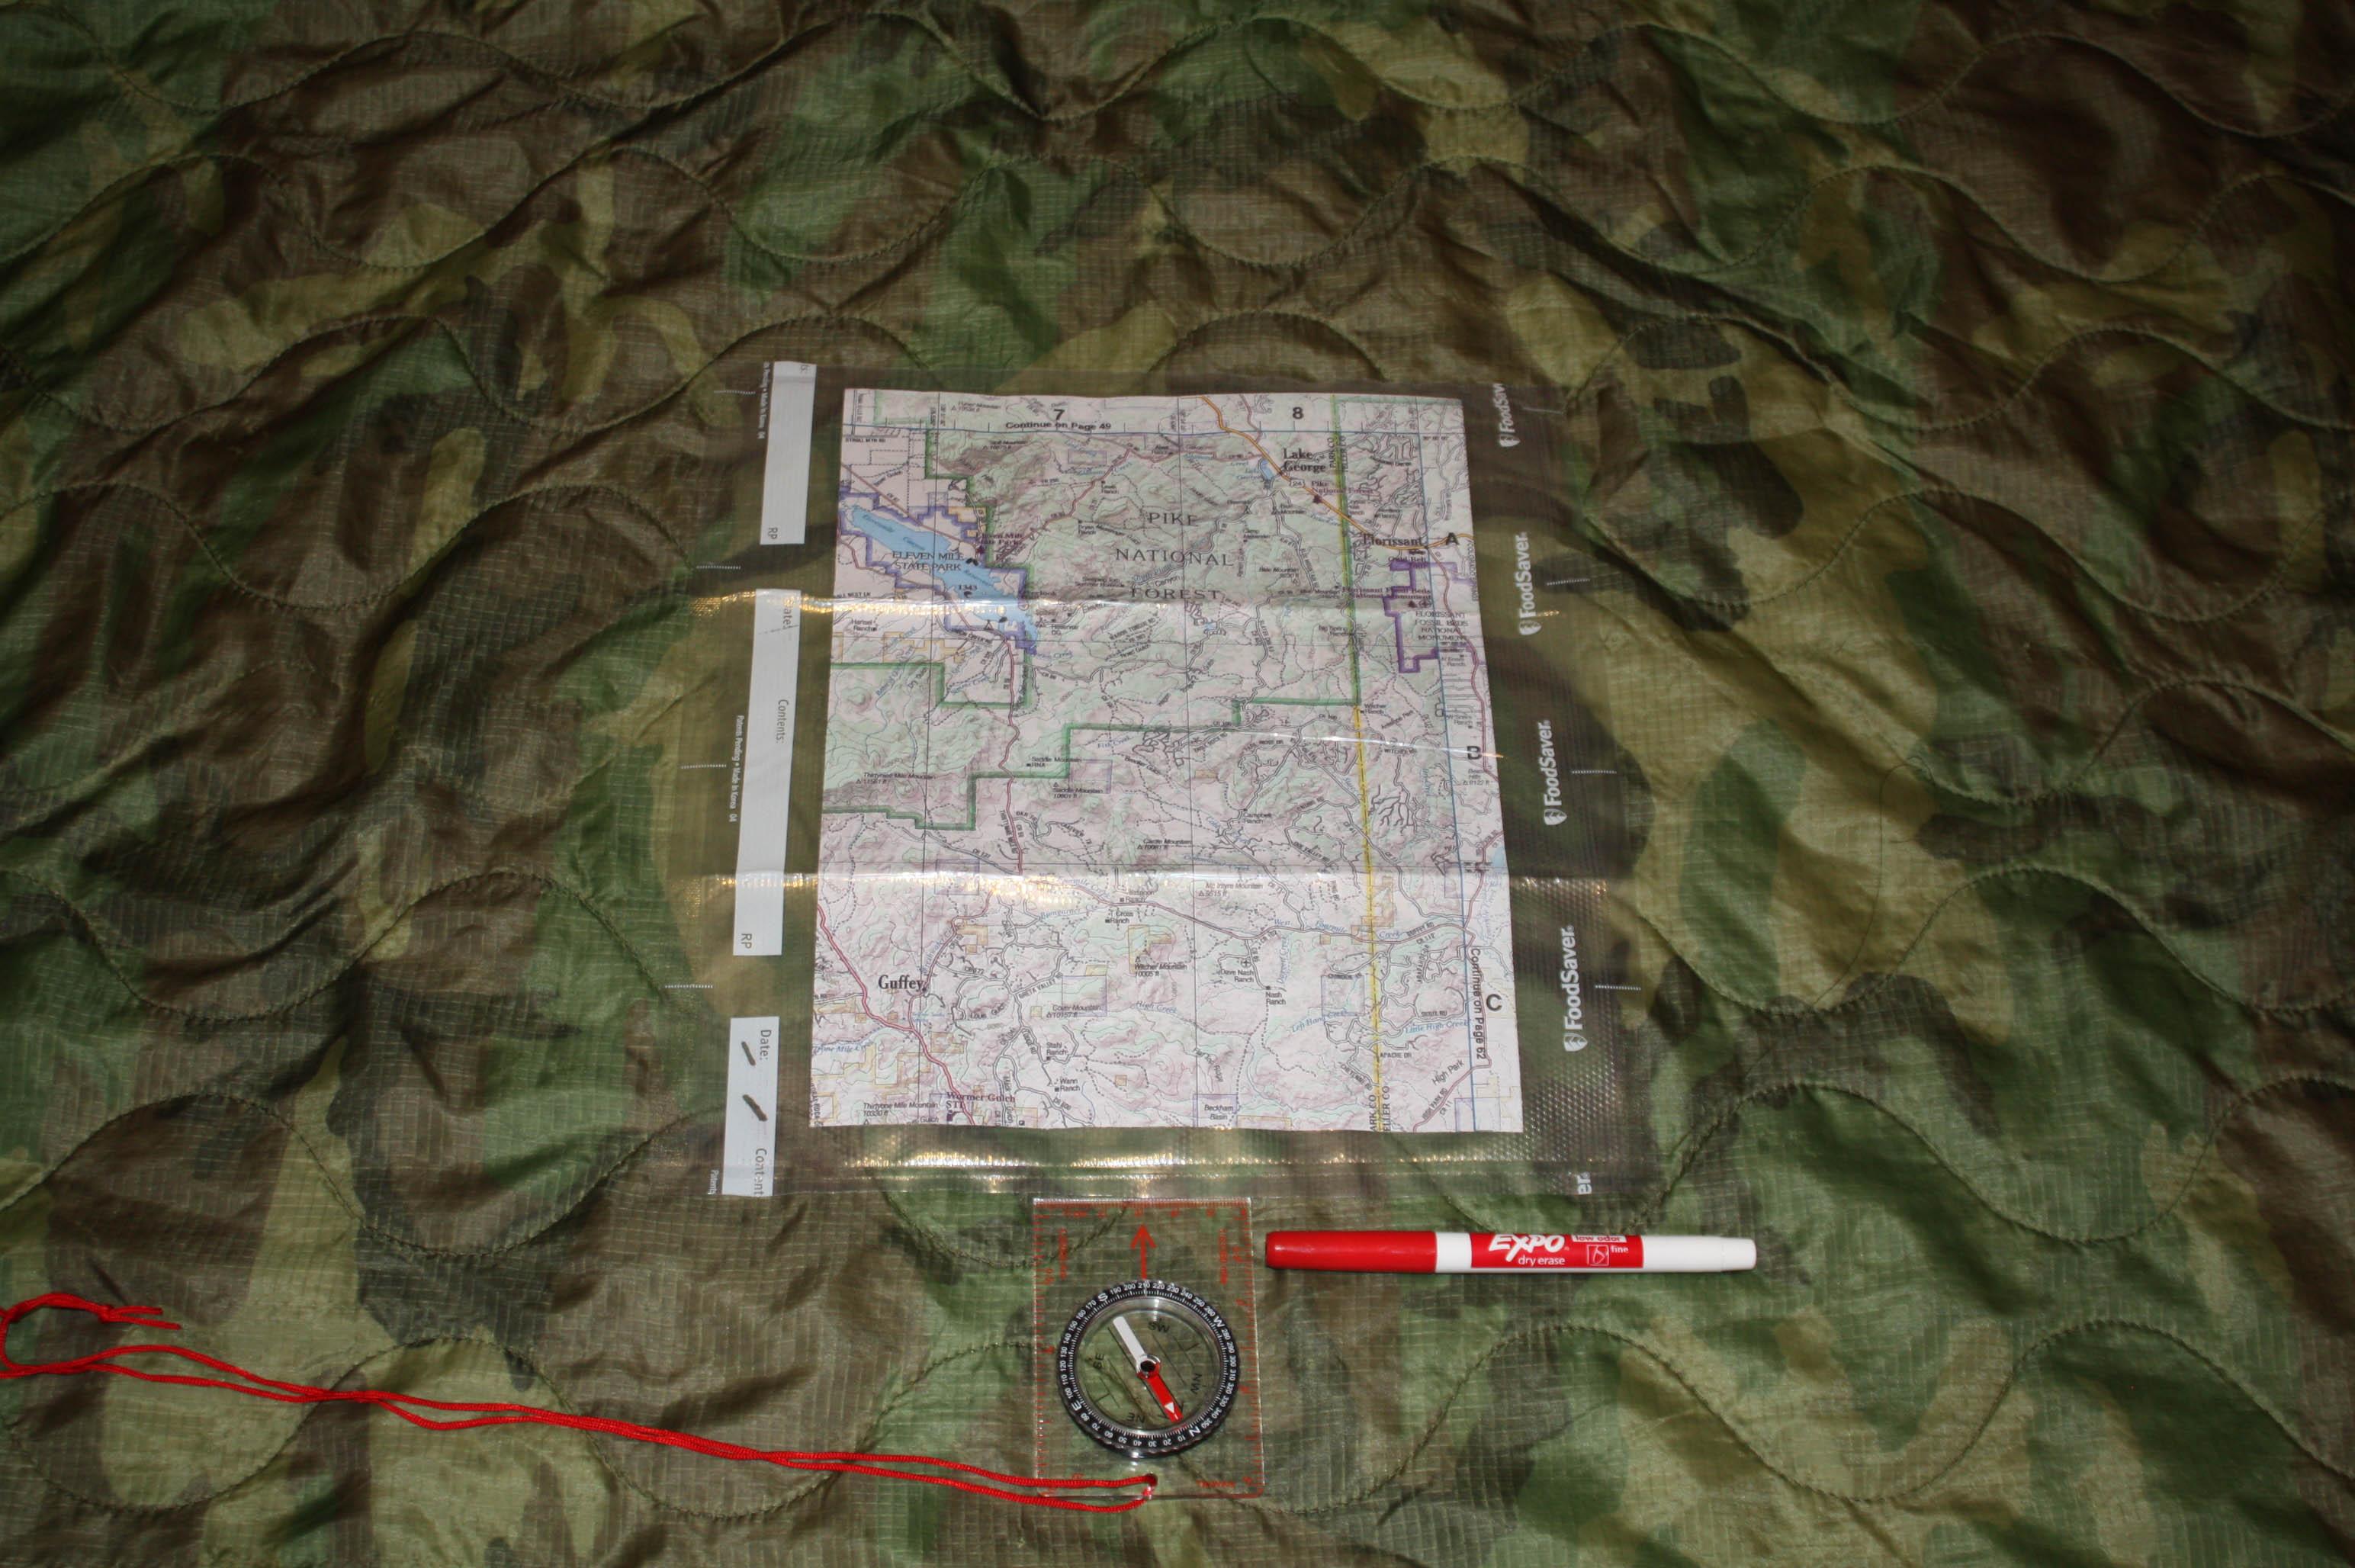 Basic Land Navigation